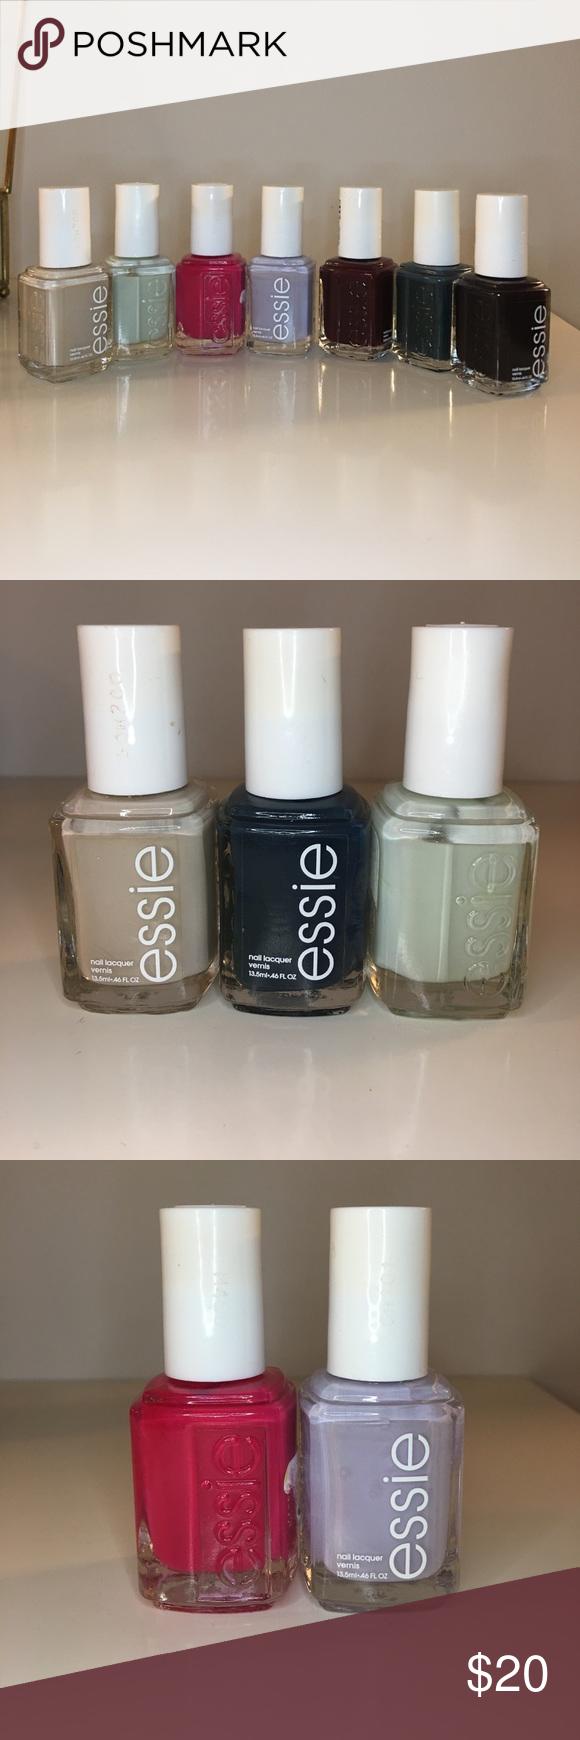 Bundle of essie nail polishes🌸 | Essie nail polish, Wicked and ...